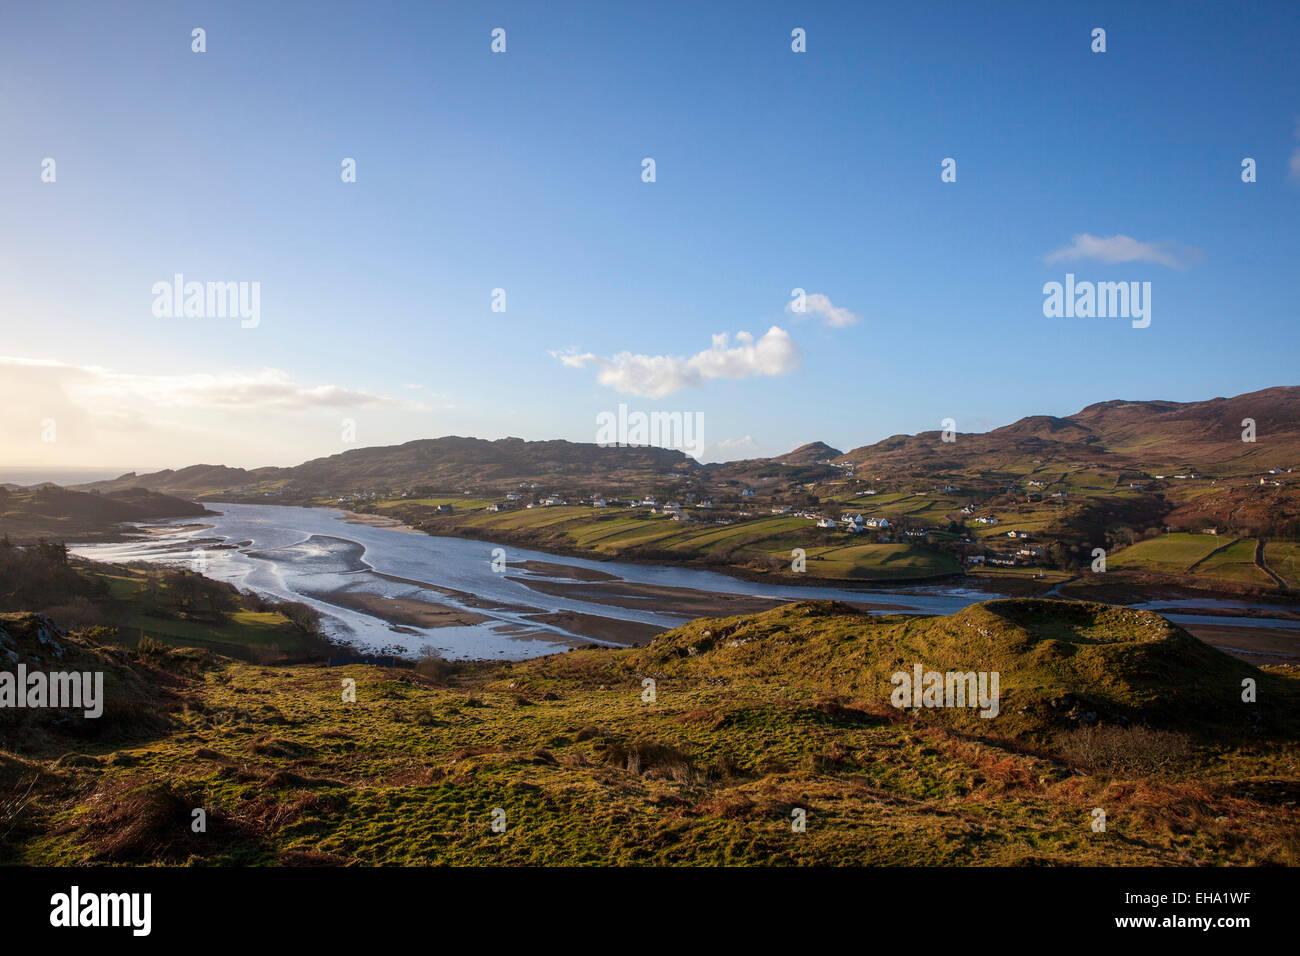 Ringfort overlooking Teelin Bay, near Carrick, Donegal, Ireland - Stock Image